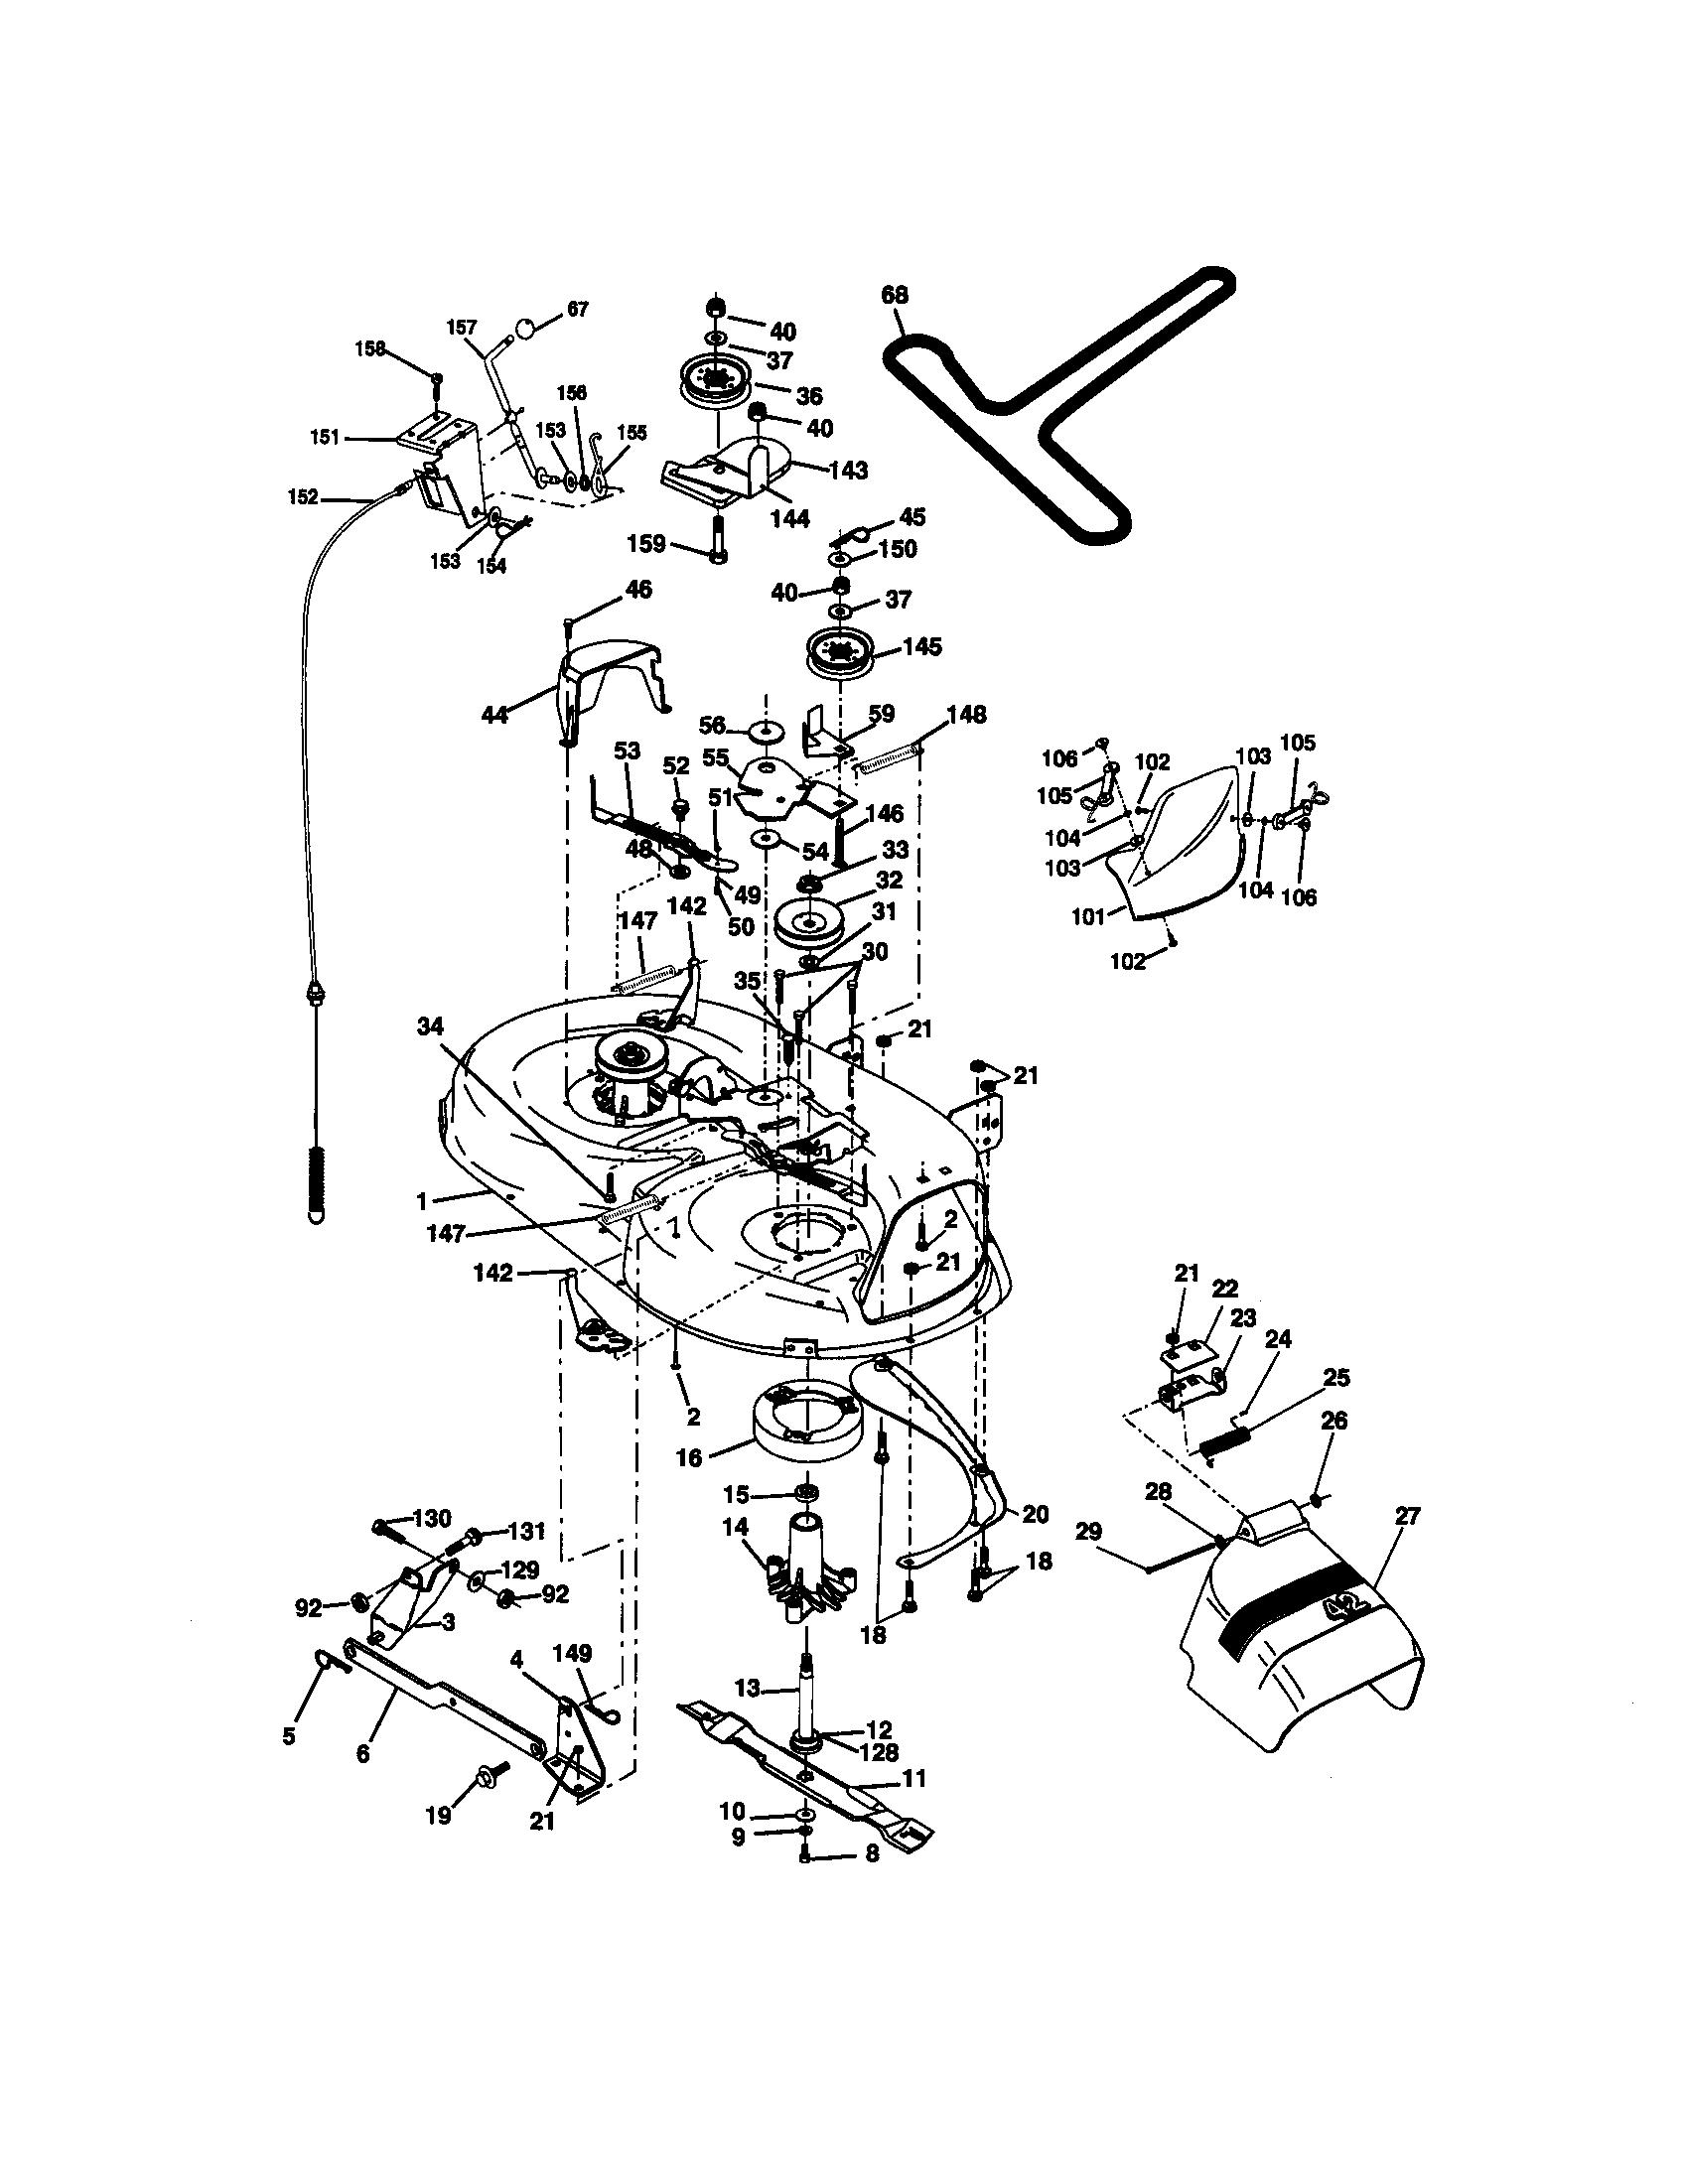 31 Craftsman Ltx 1000 Parts Diagram